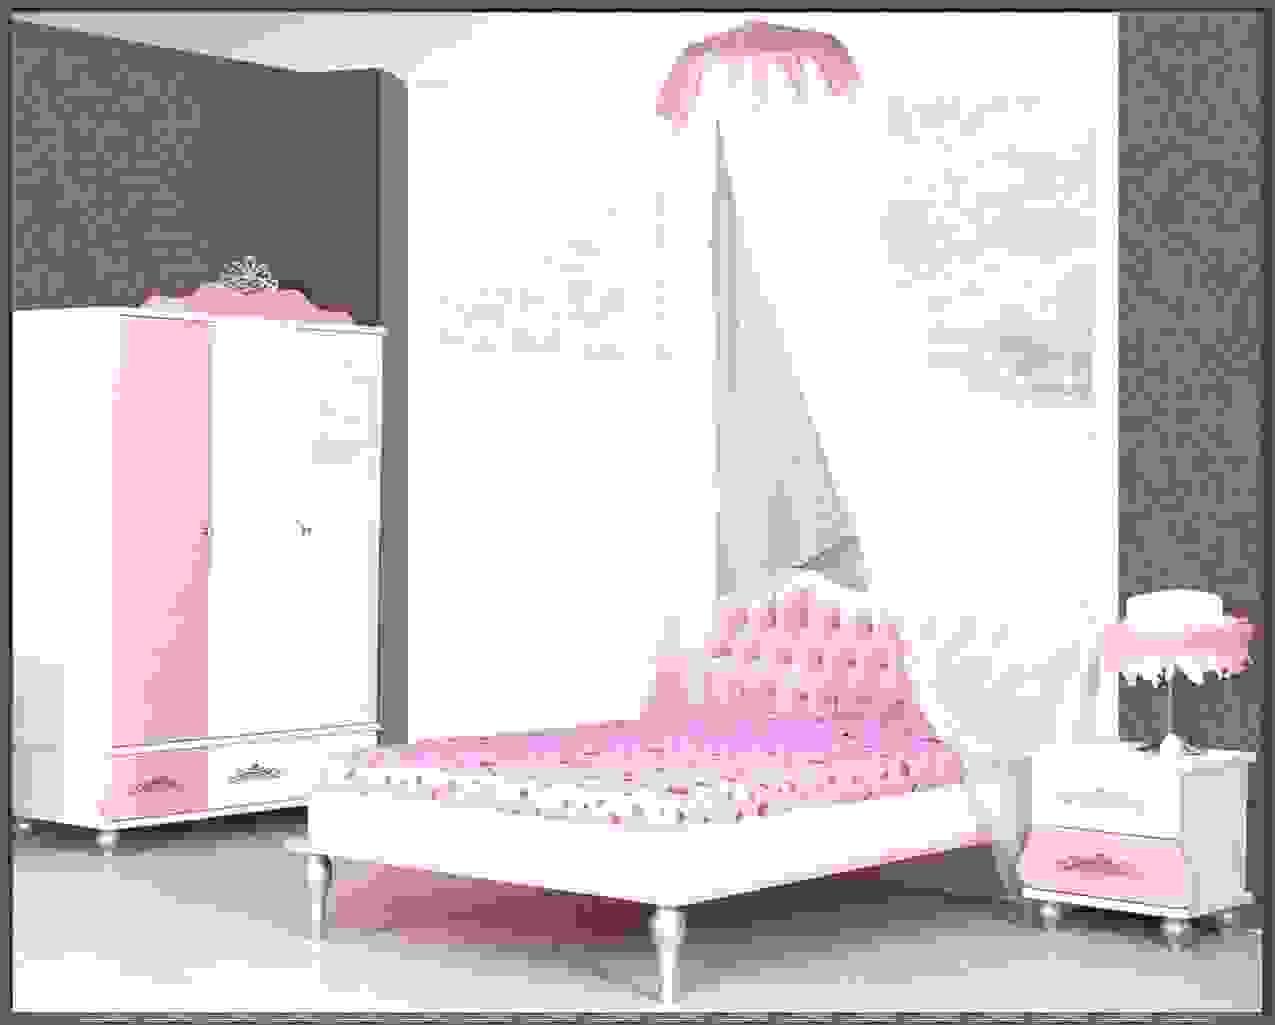 Prinzessin Bett Selber Bauen Fabulous Kinderbett Hochbett Mit Von von Prinzessin Bett Selber Bauen Photo